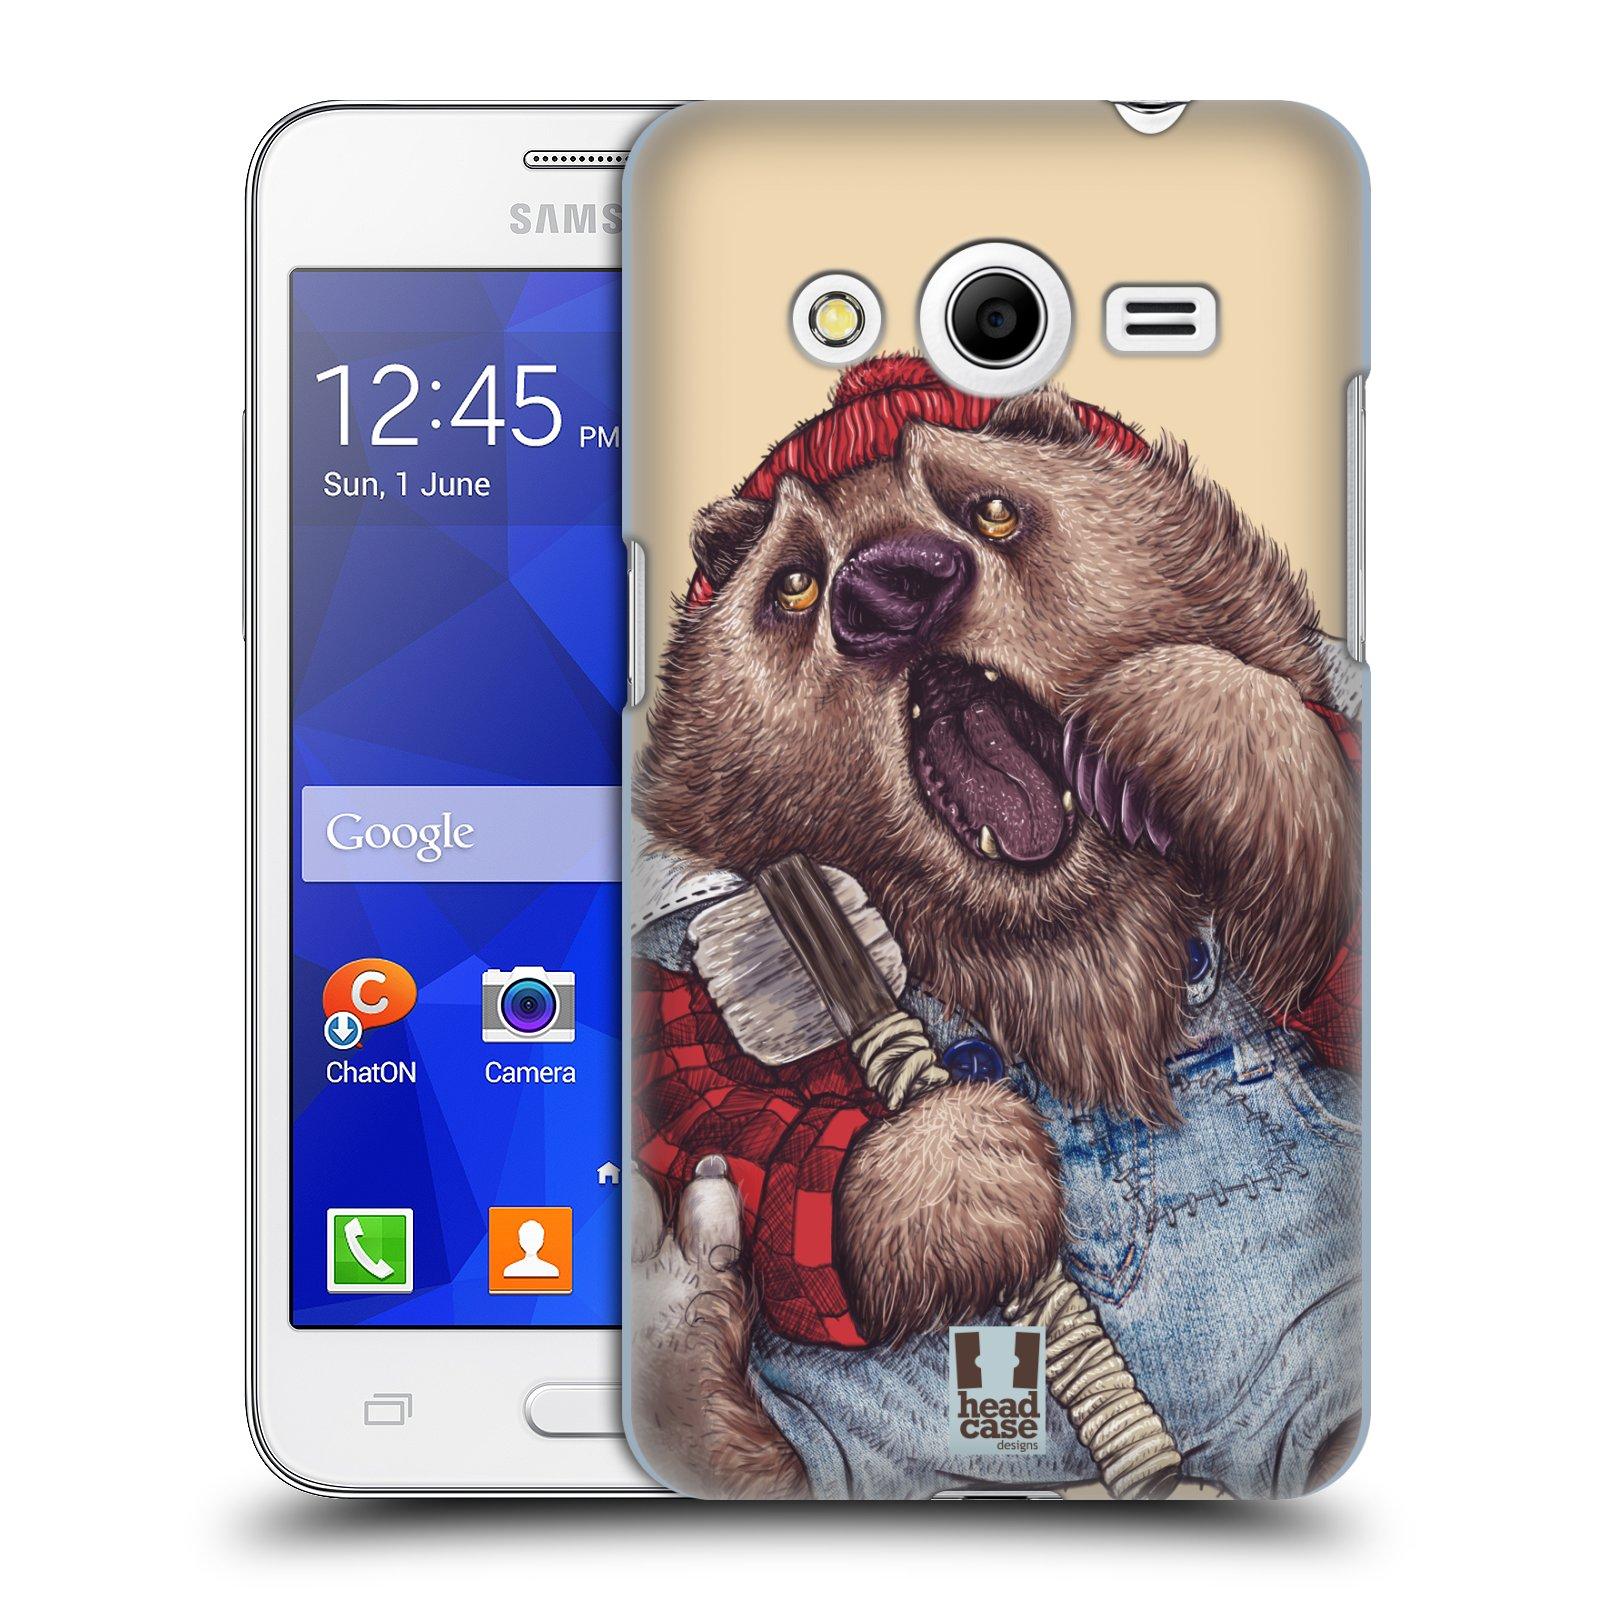 HEAD CASE plastový obal na mobil SAMSUNG GALAXY Core 2 (G355H) vzor Kreslená zvířátka medvěd